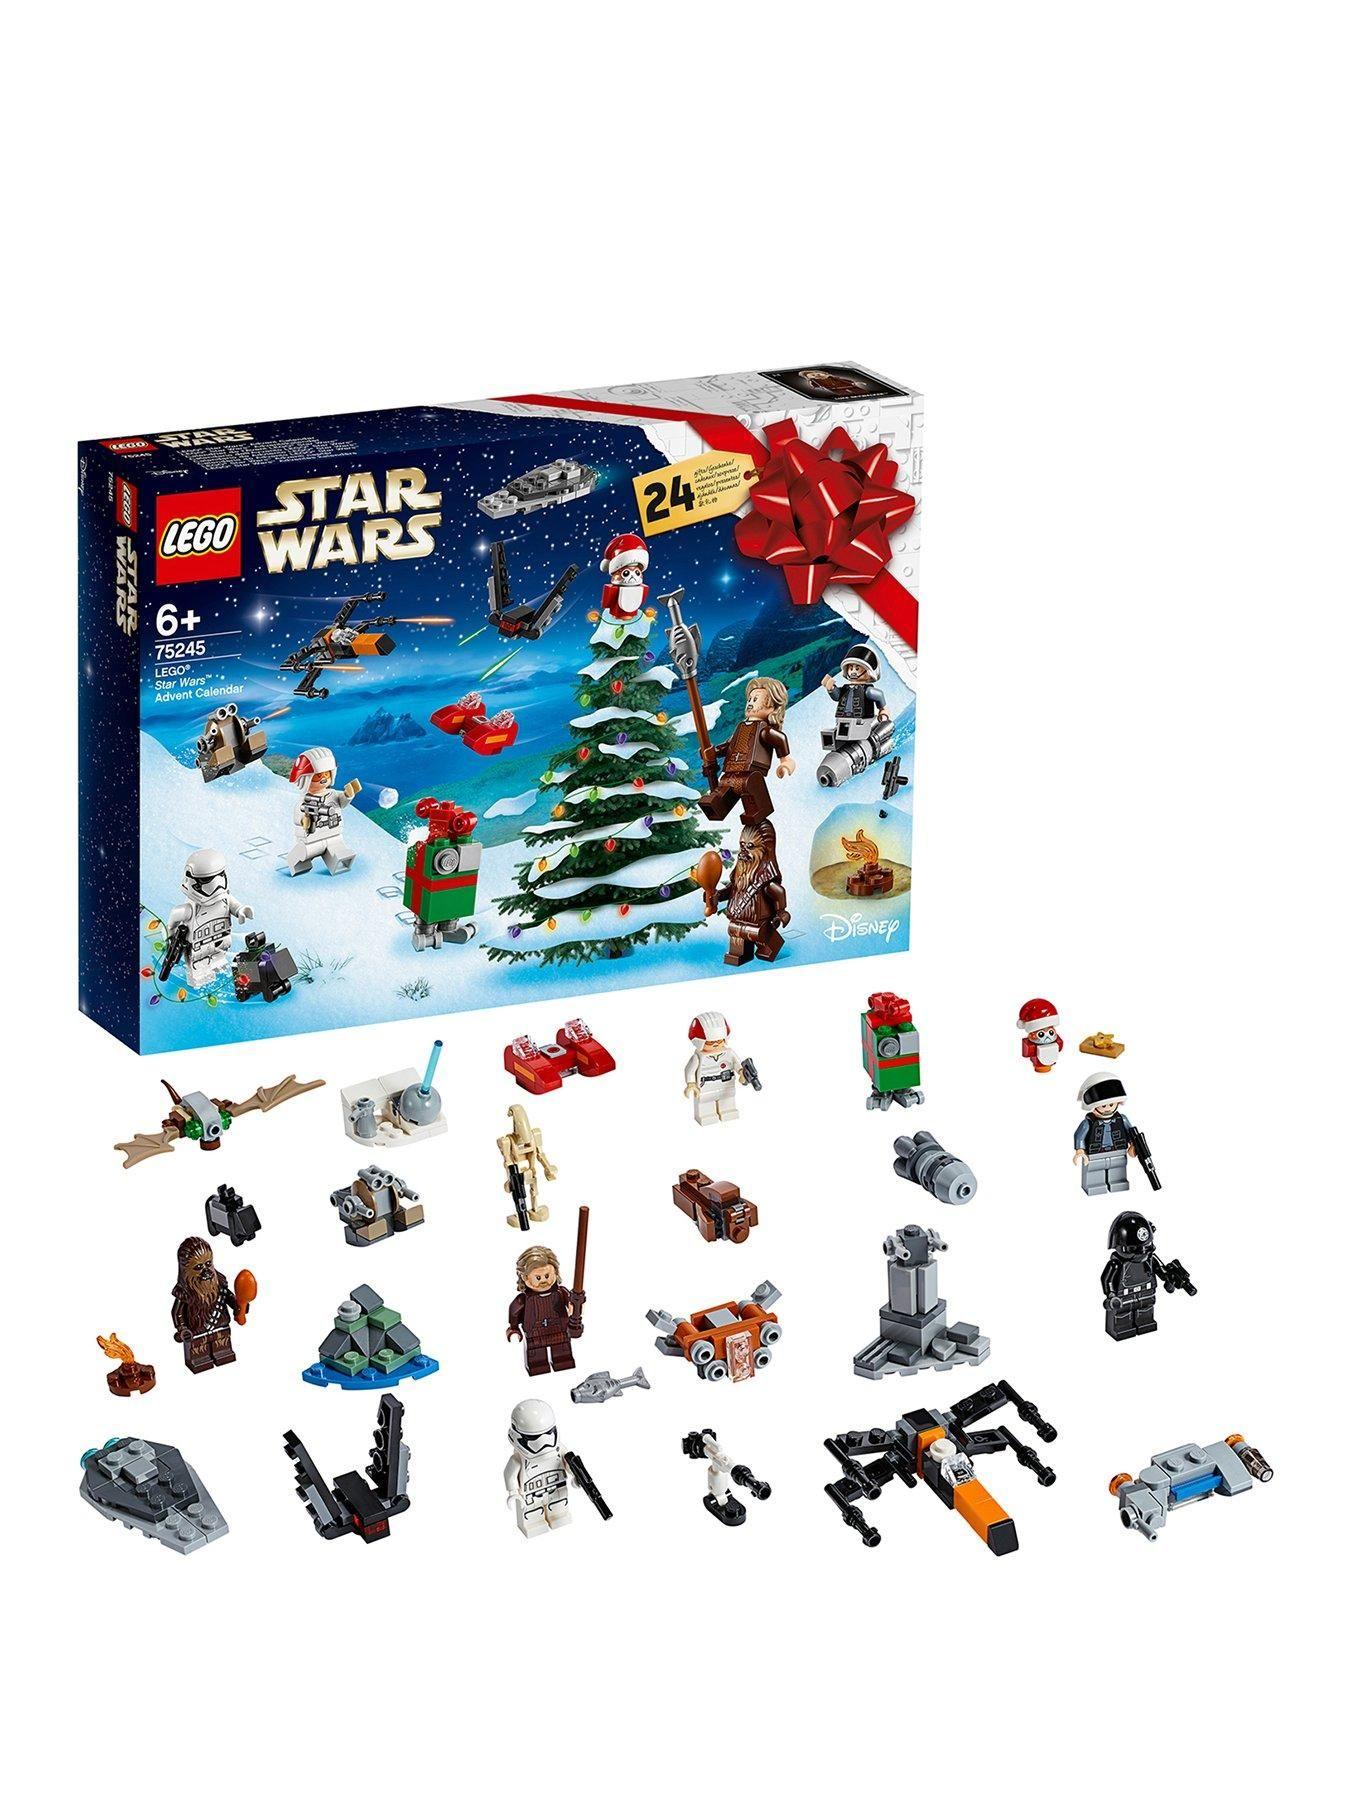 75245 Advent Calendar 2019 With 24 Mini Sets Star Wars Advent